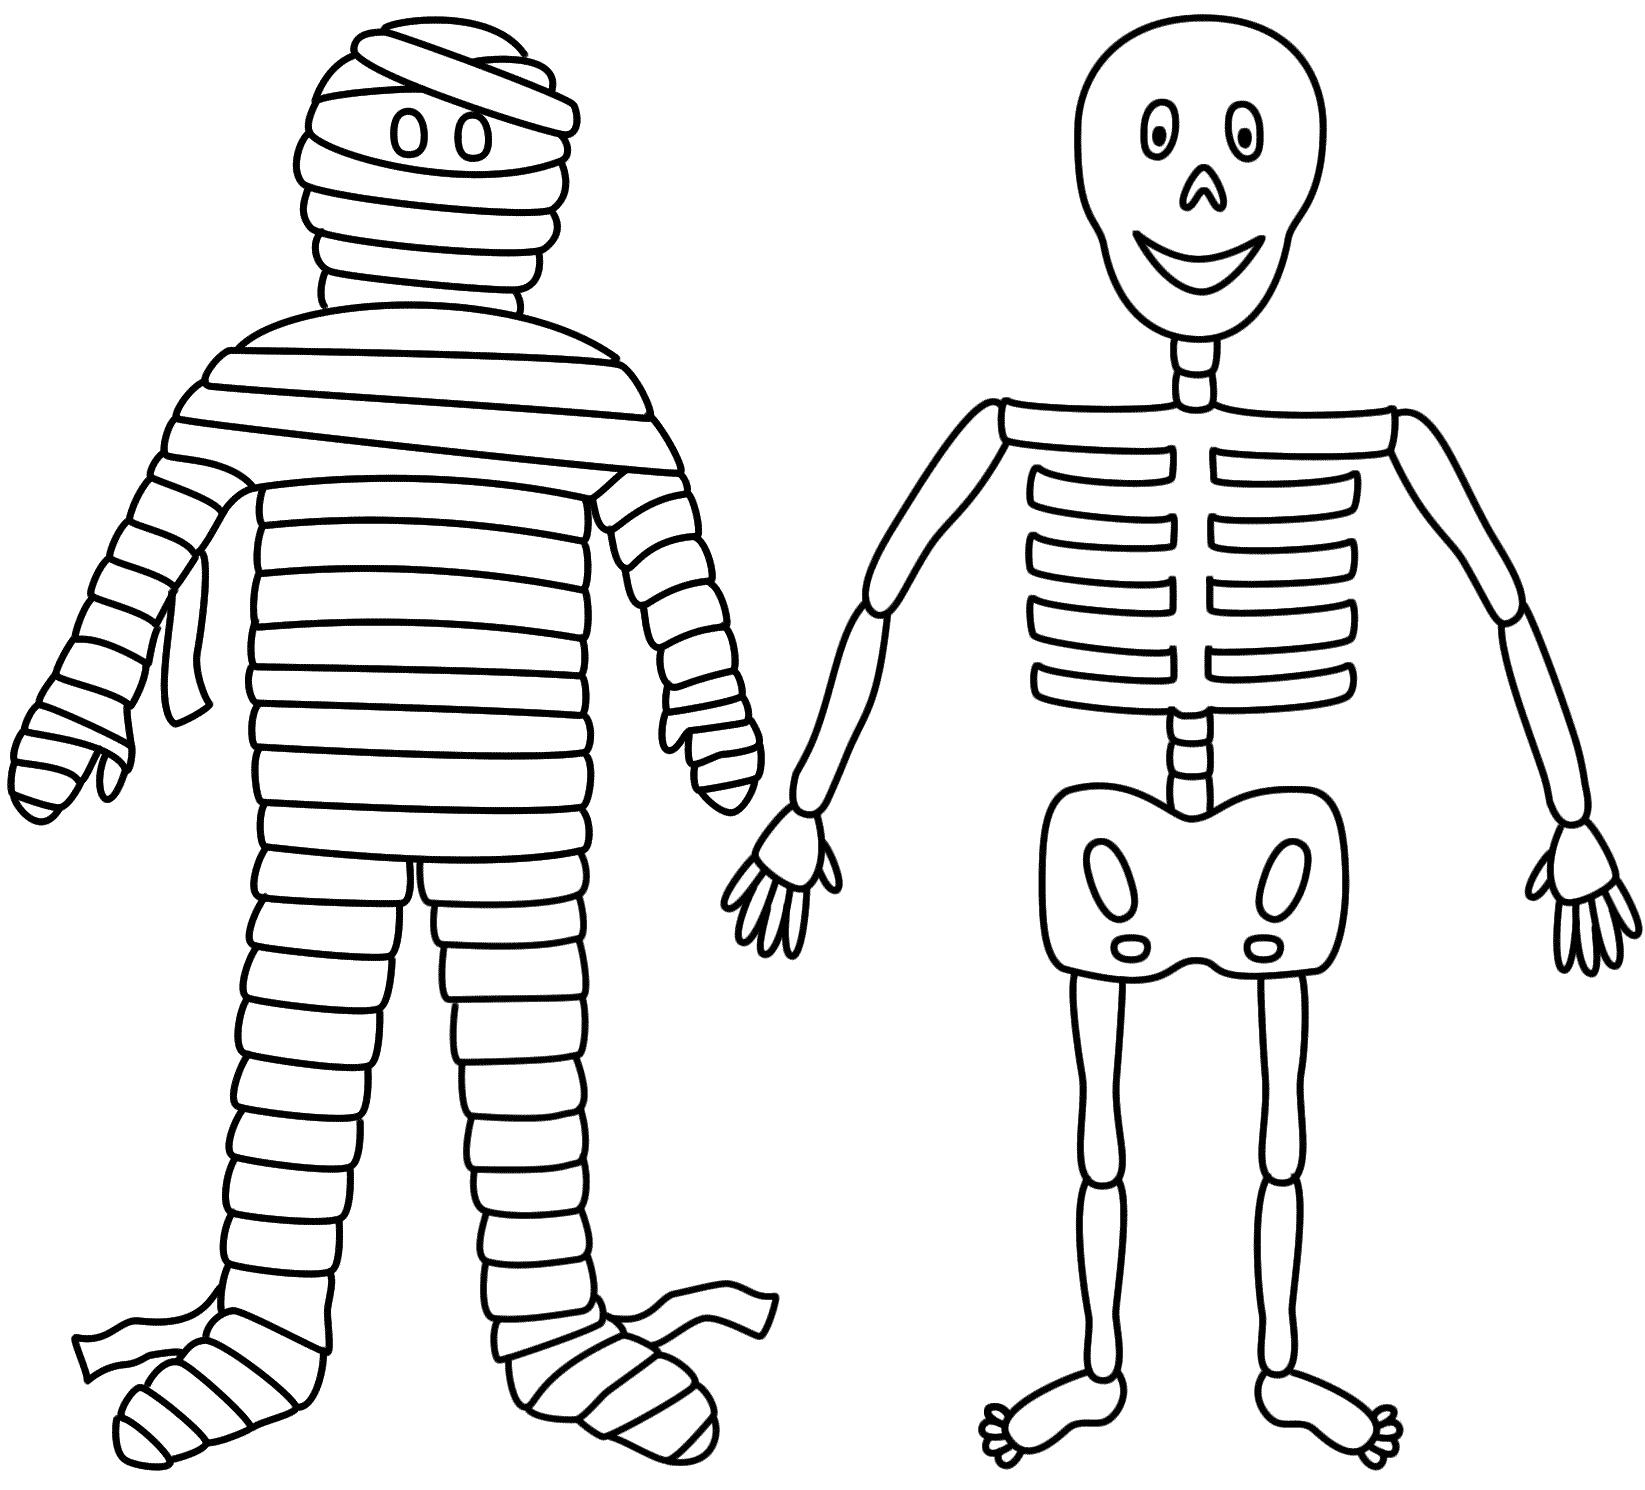 Drawn sleleton printable halloween Page Coloring (Halloween) coloring Skeleton